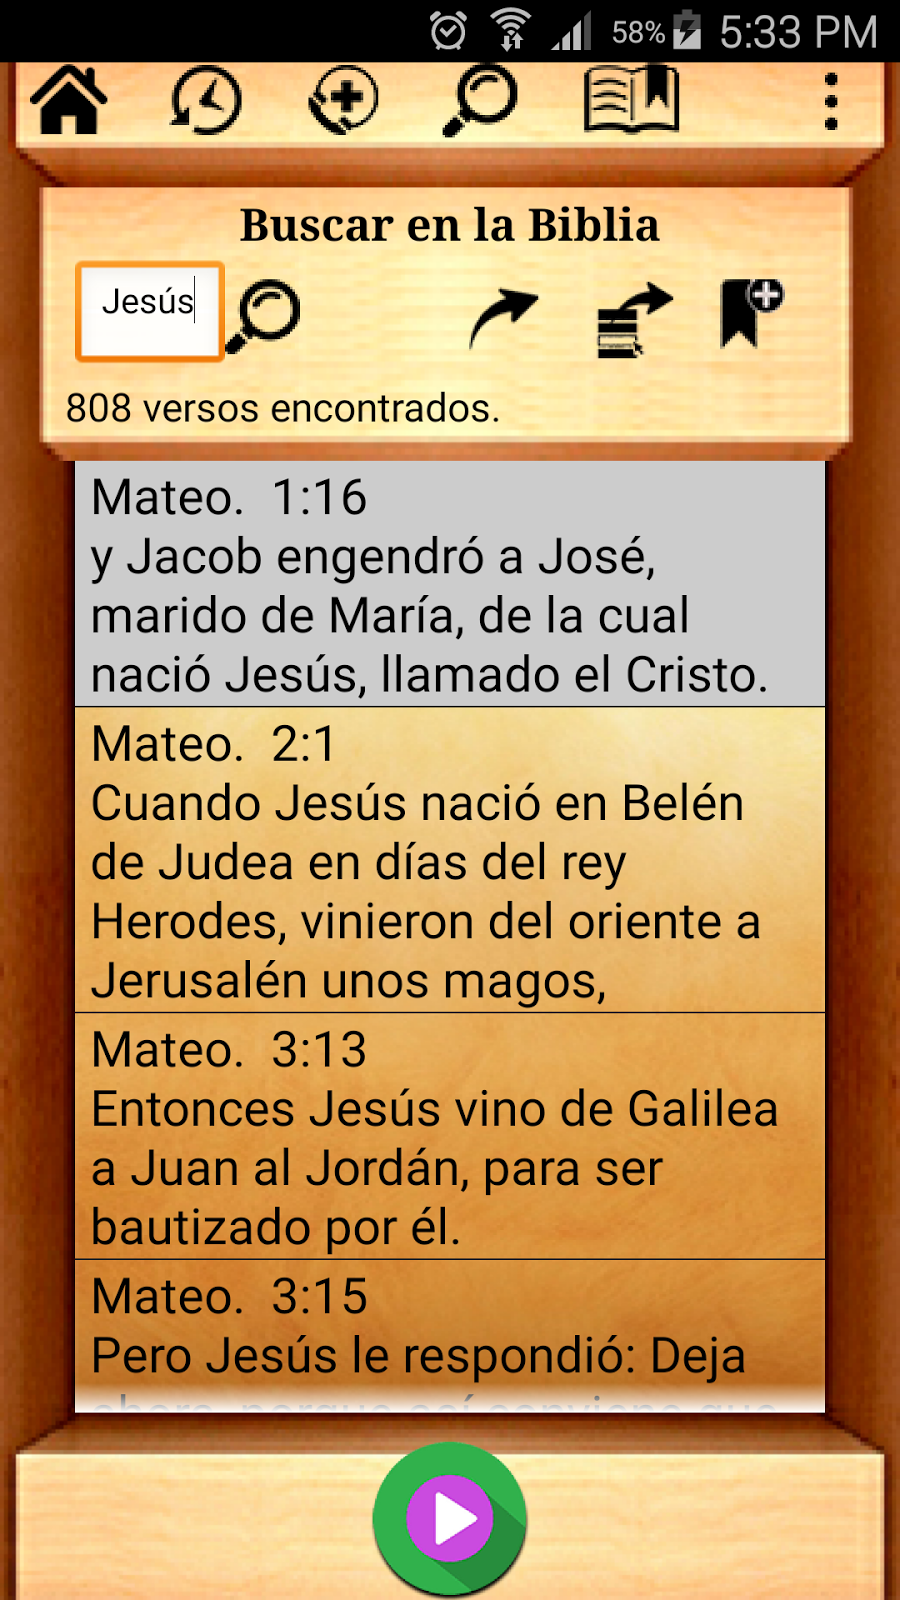 Internet citas biblia